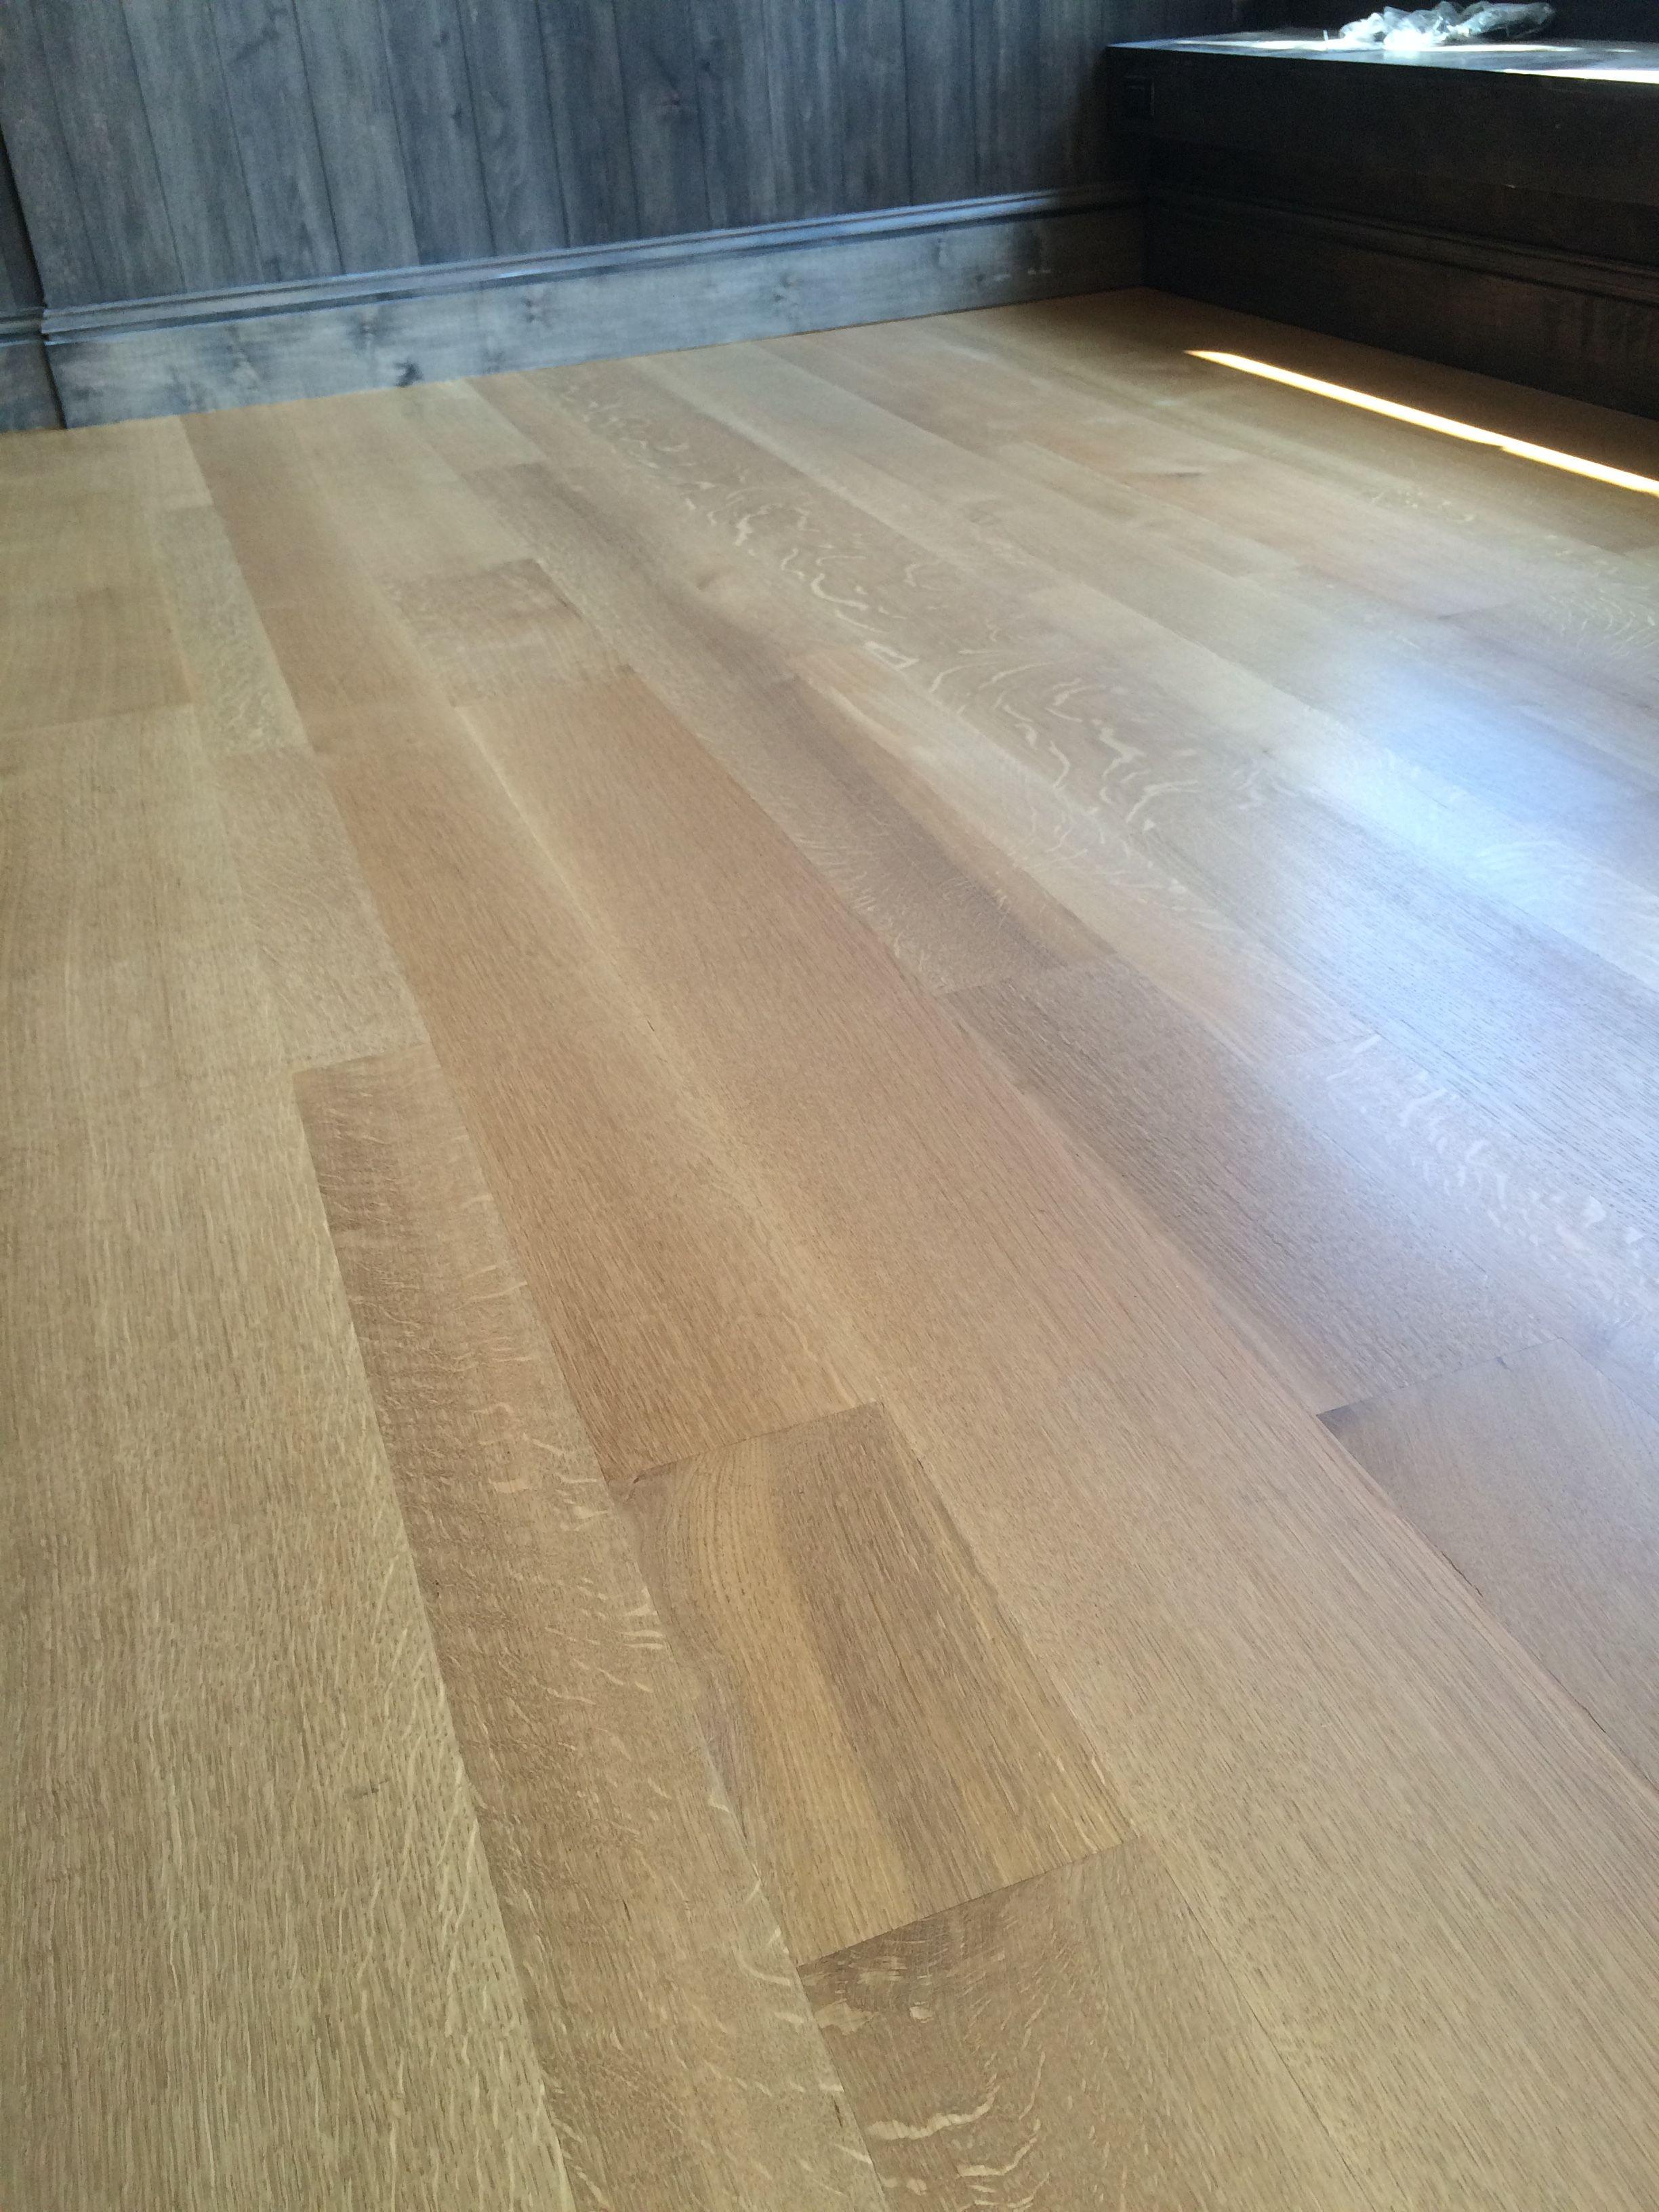 Wide plank random width quarter sawn white oak hardwood flooring with bona traffic hd system